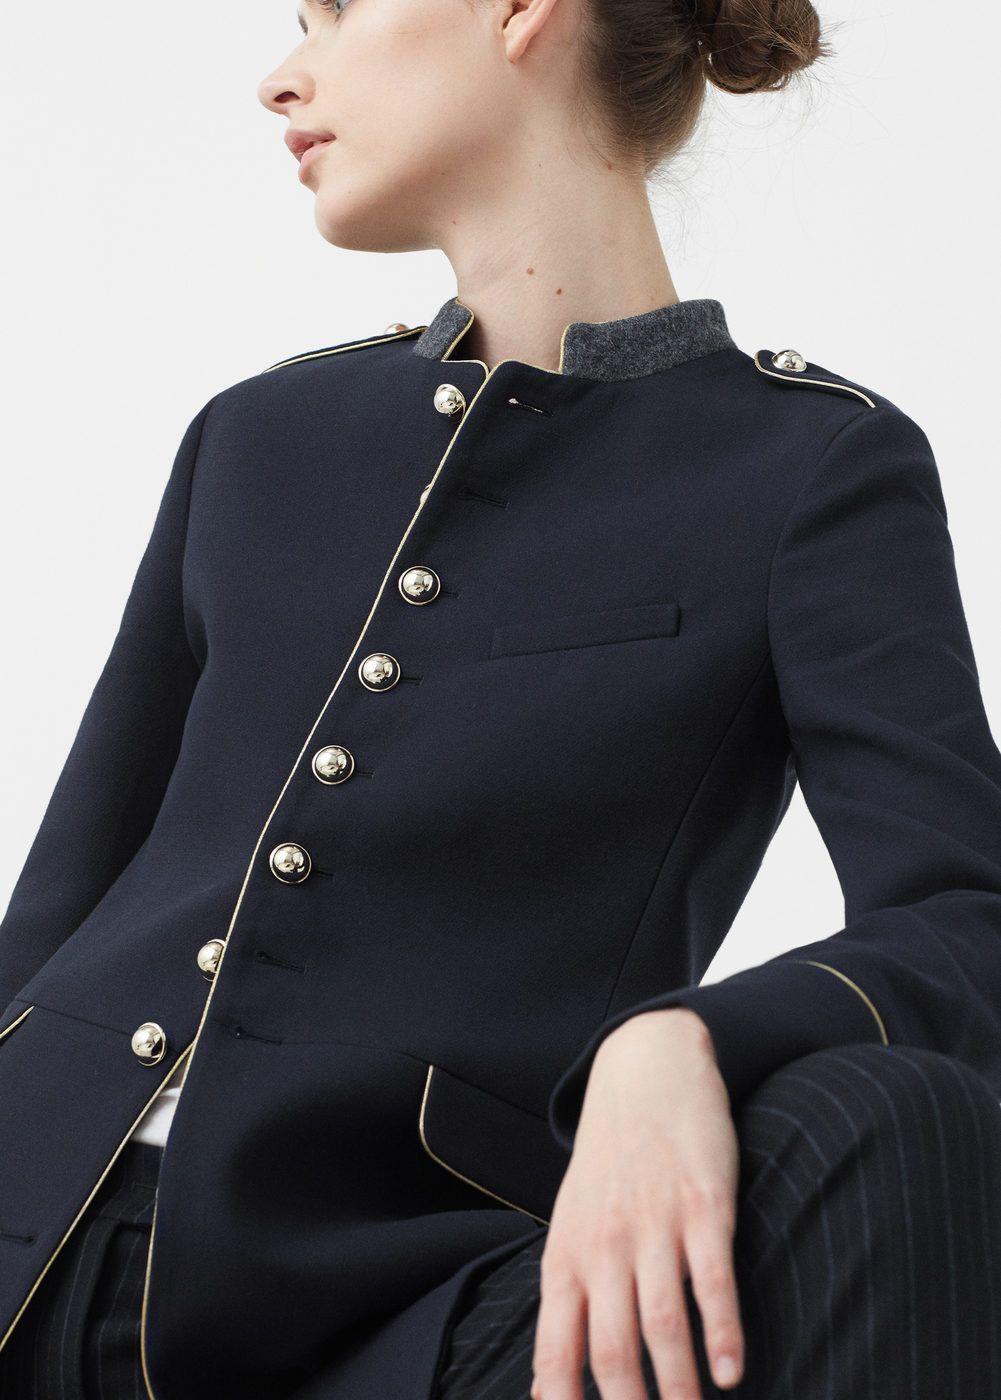 Chaqueta militar mujer usa